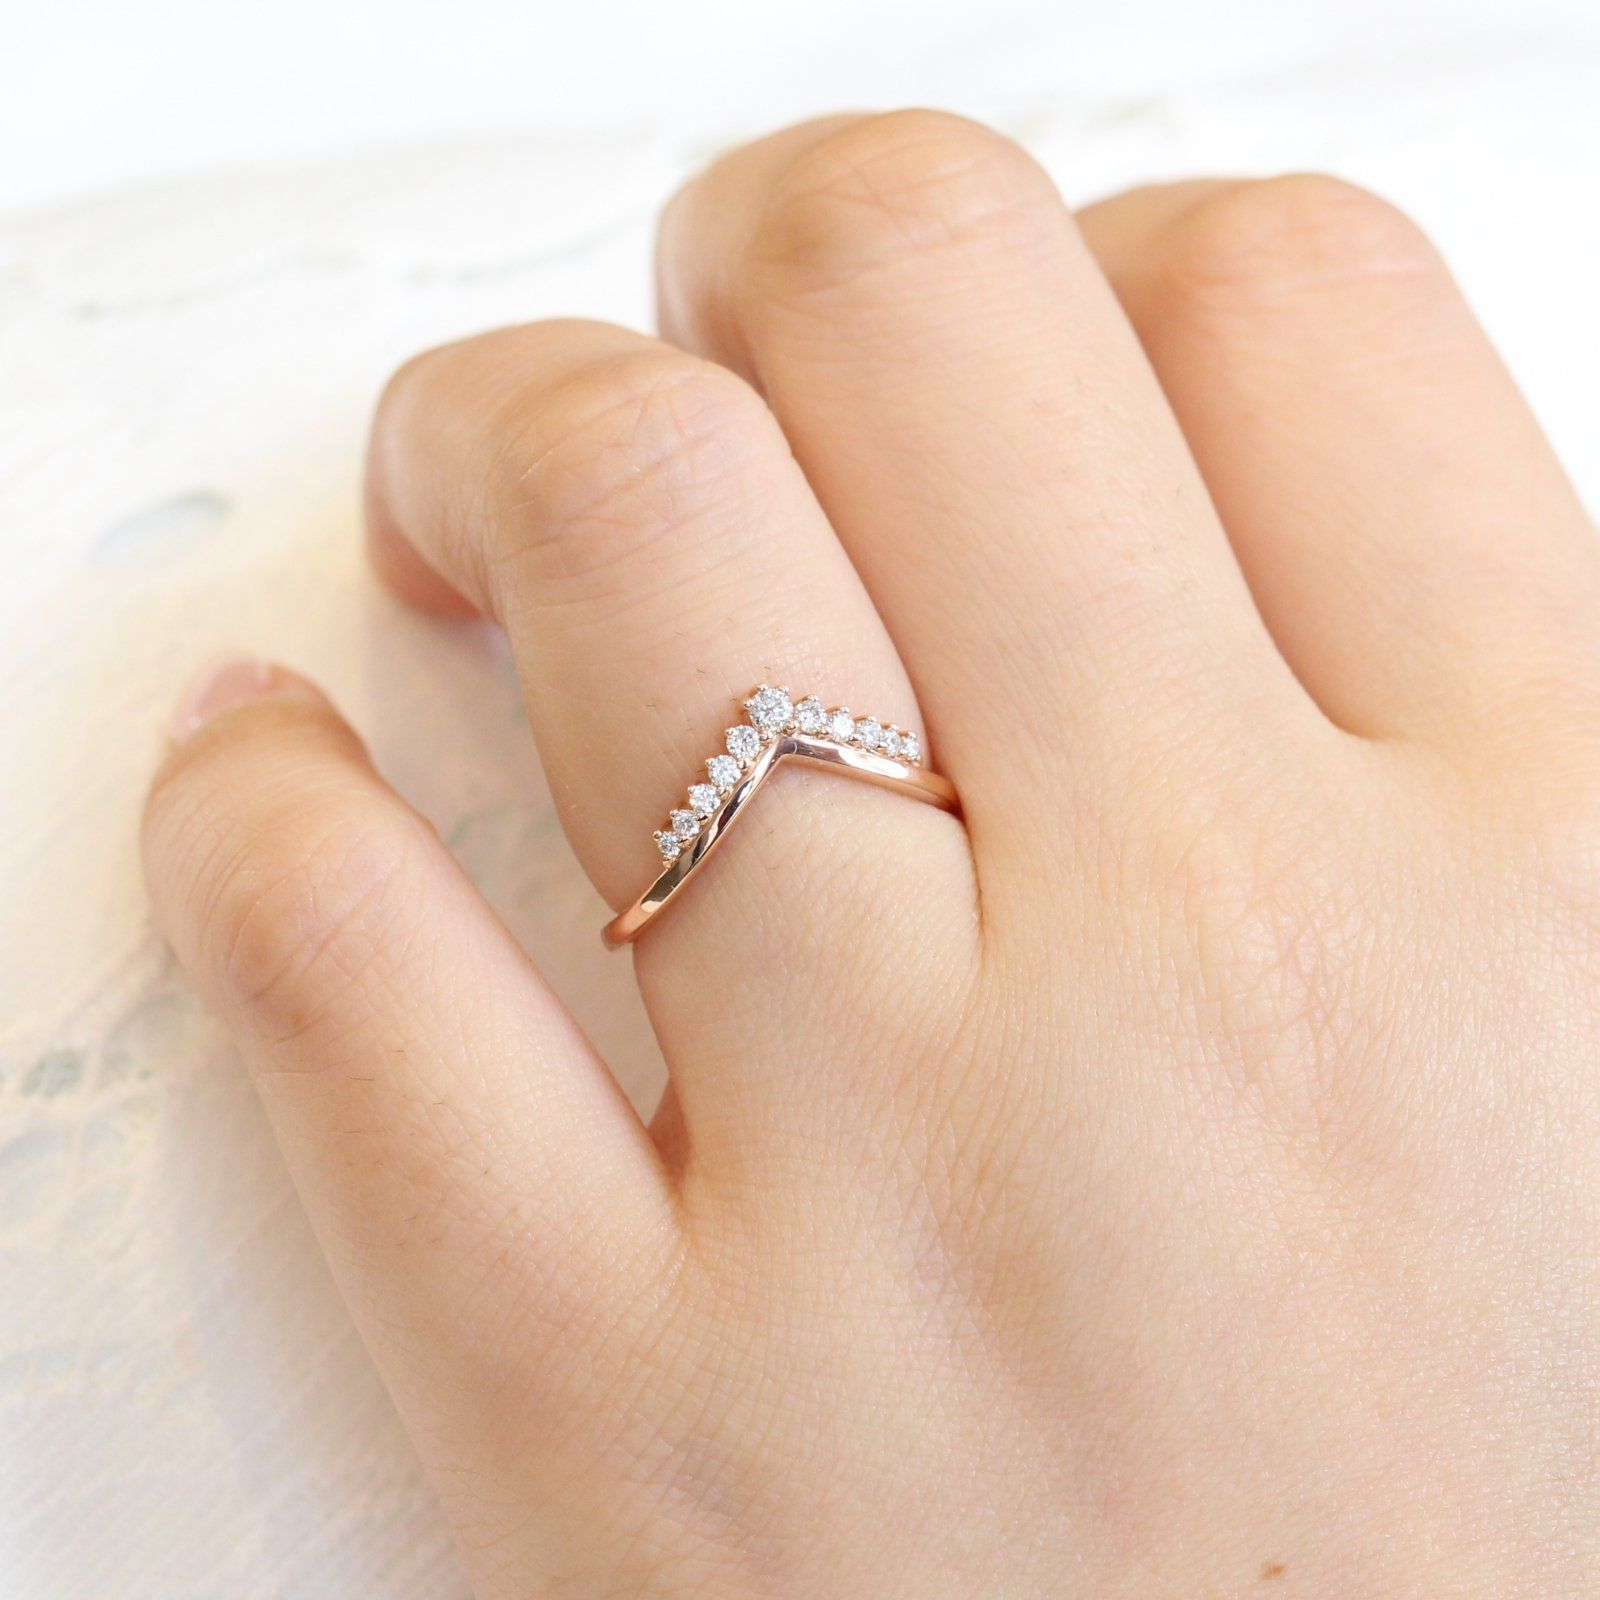 Tiara Diamond Ring In Rose Gold Curved Plain Band Diamond